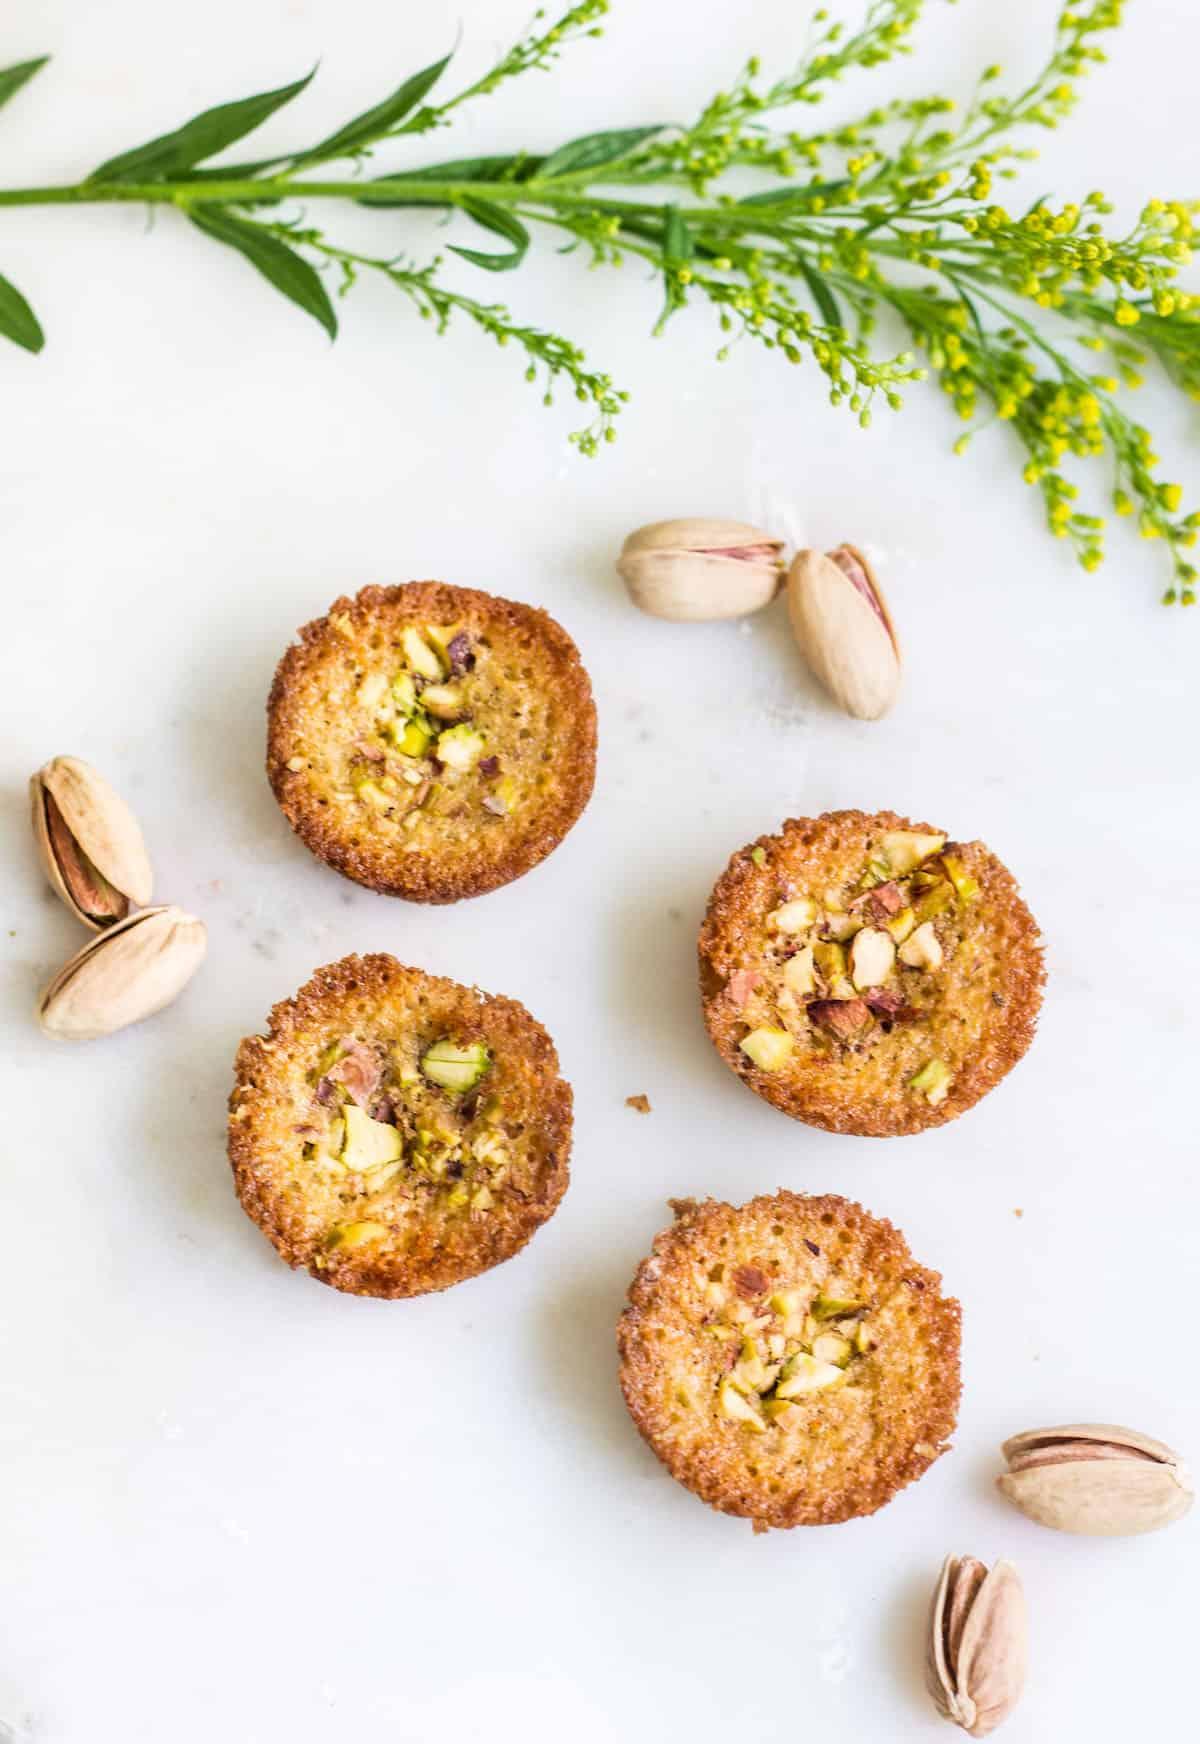 Pistachio Financiers: little almond French cakes flavored with pistachios and brown butter. Recipe via MonPetitFour.com